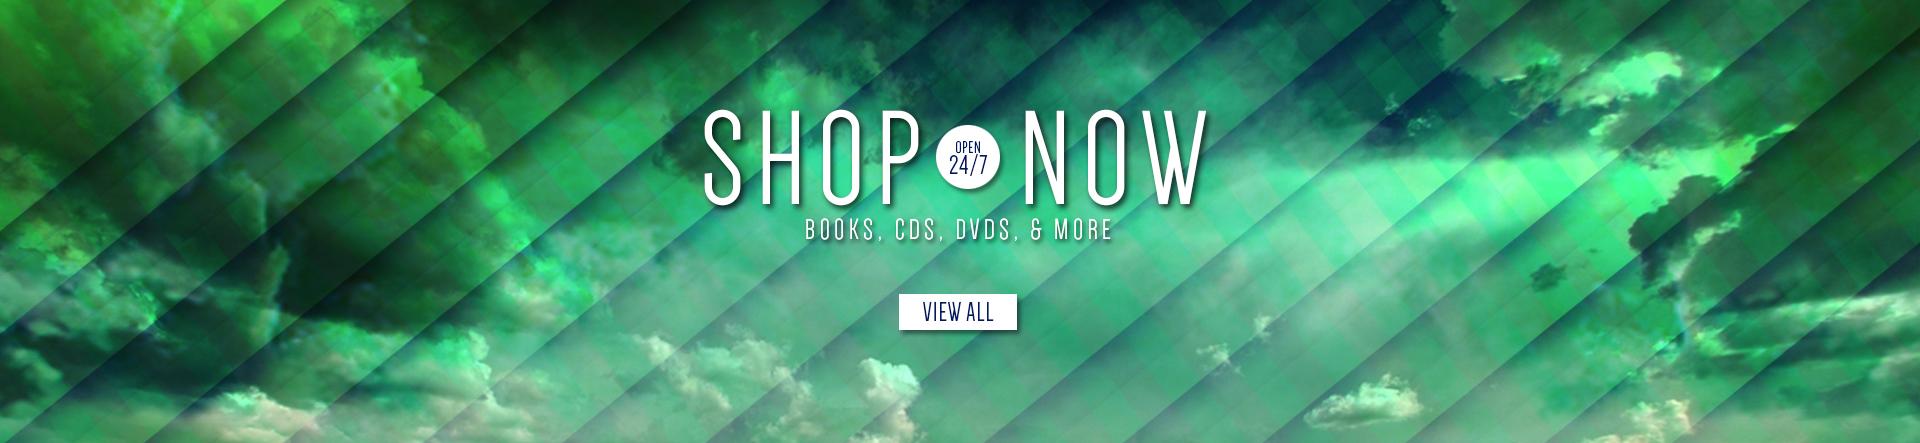 shop-online-graphic1